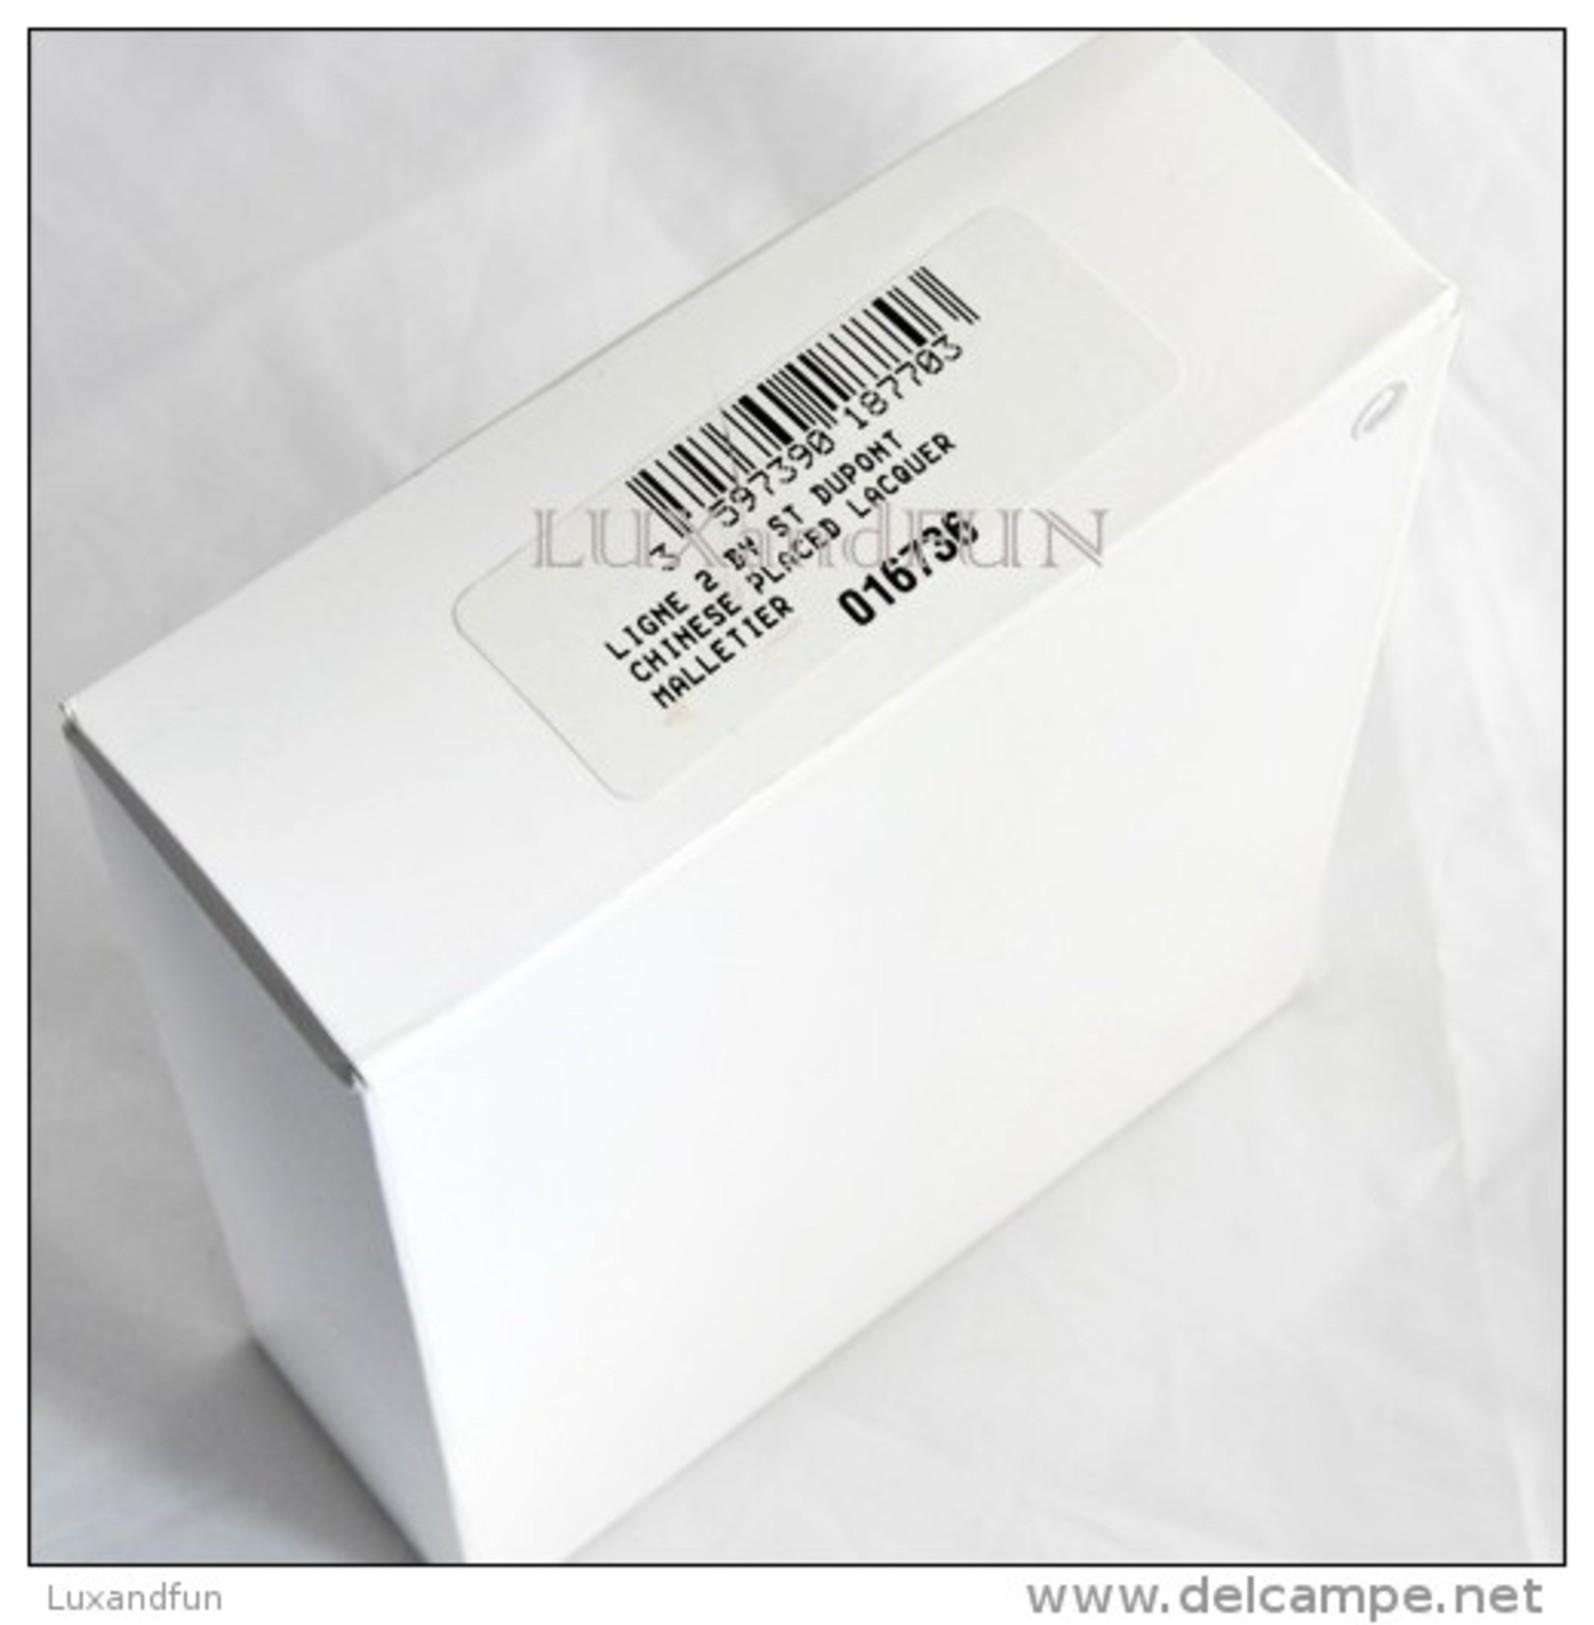 S.T. Dupont Lighter L2 Malletier Lacquer Palladium - Accendino Premium Edition - Never Used - Dupont